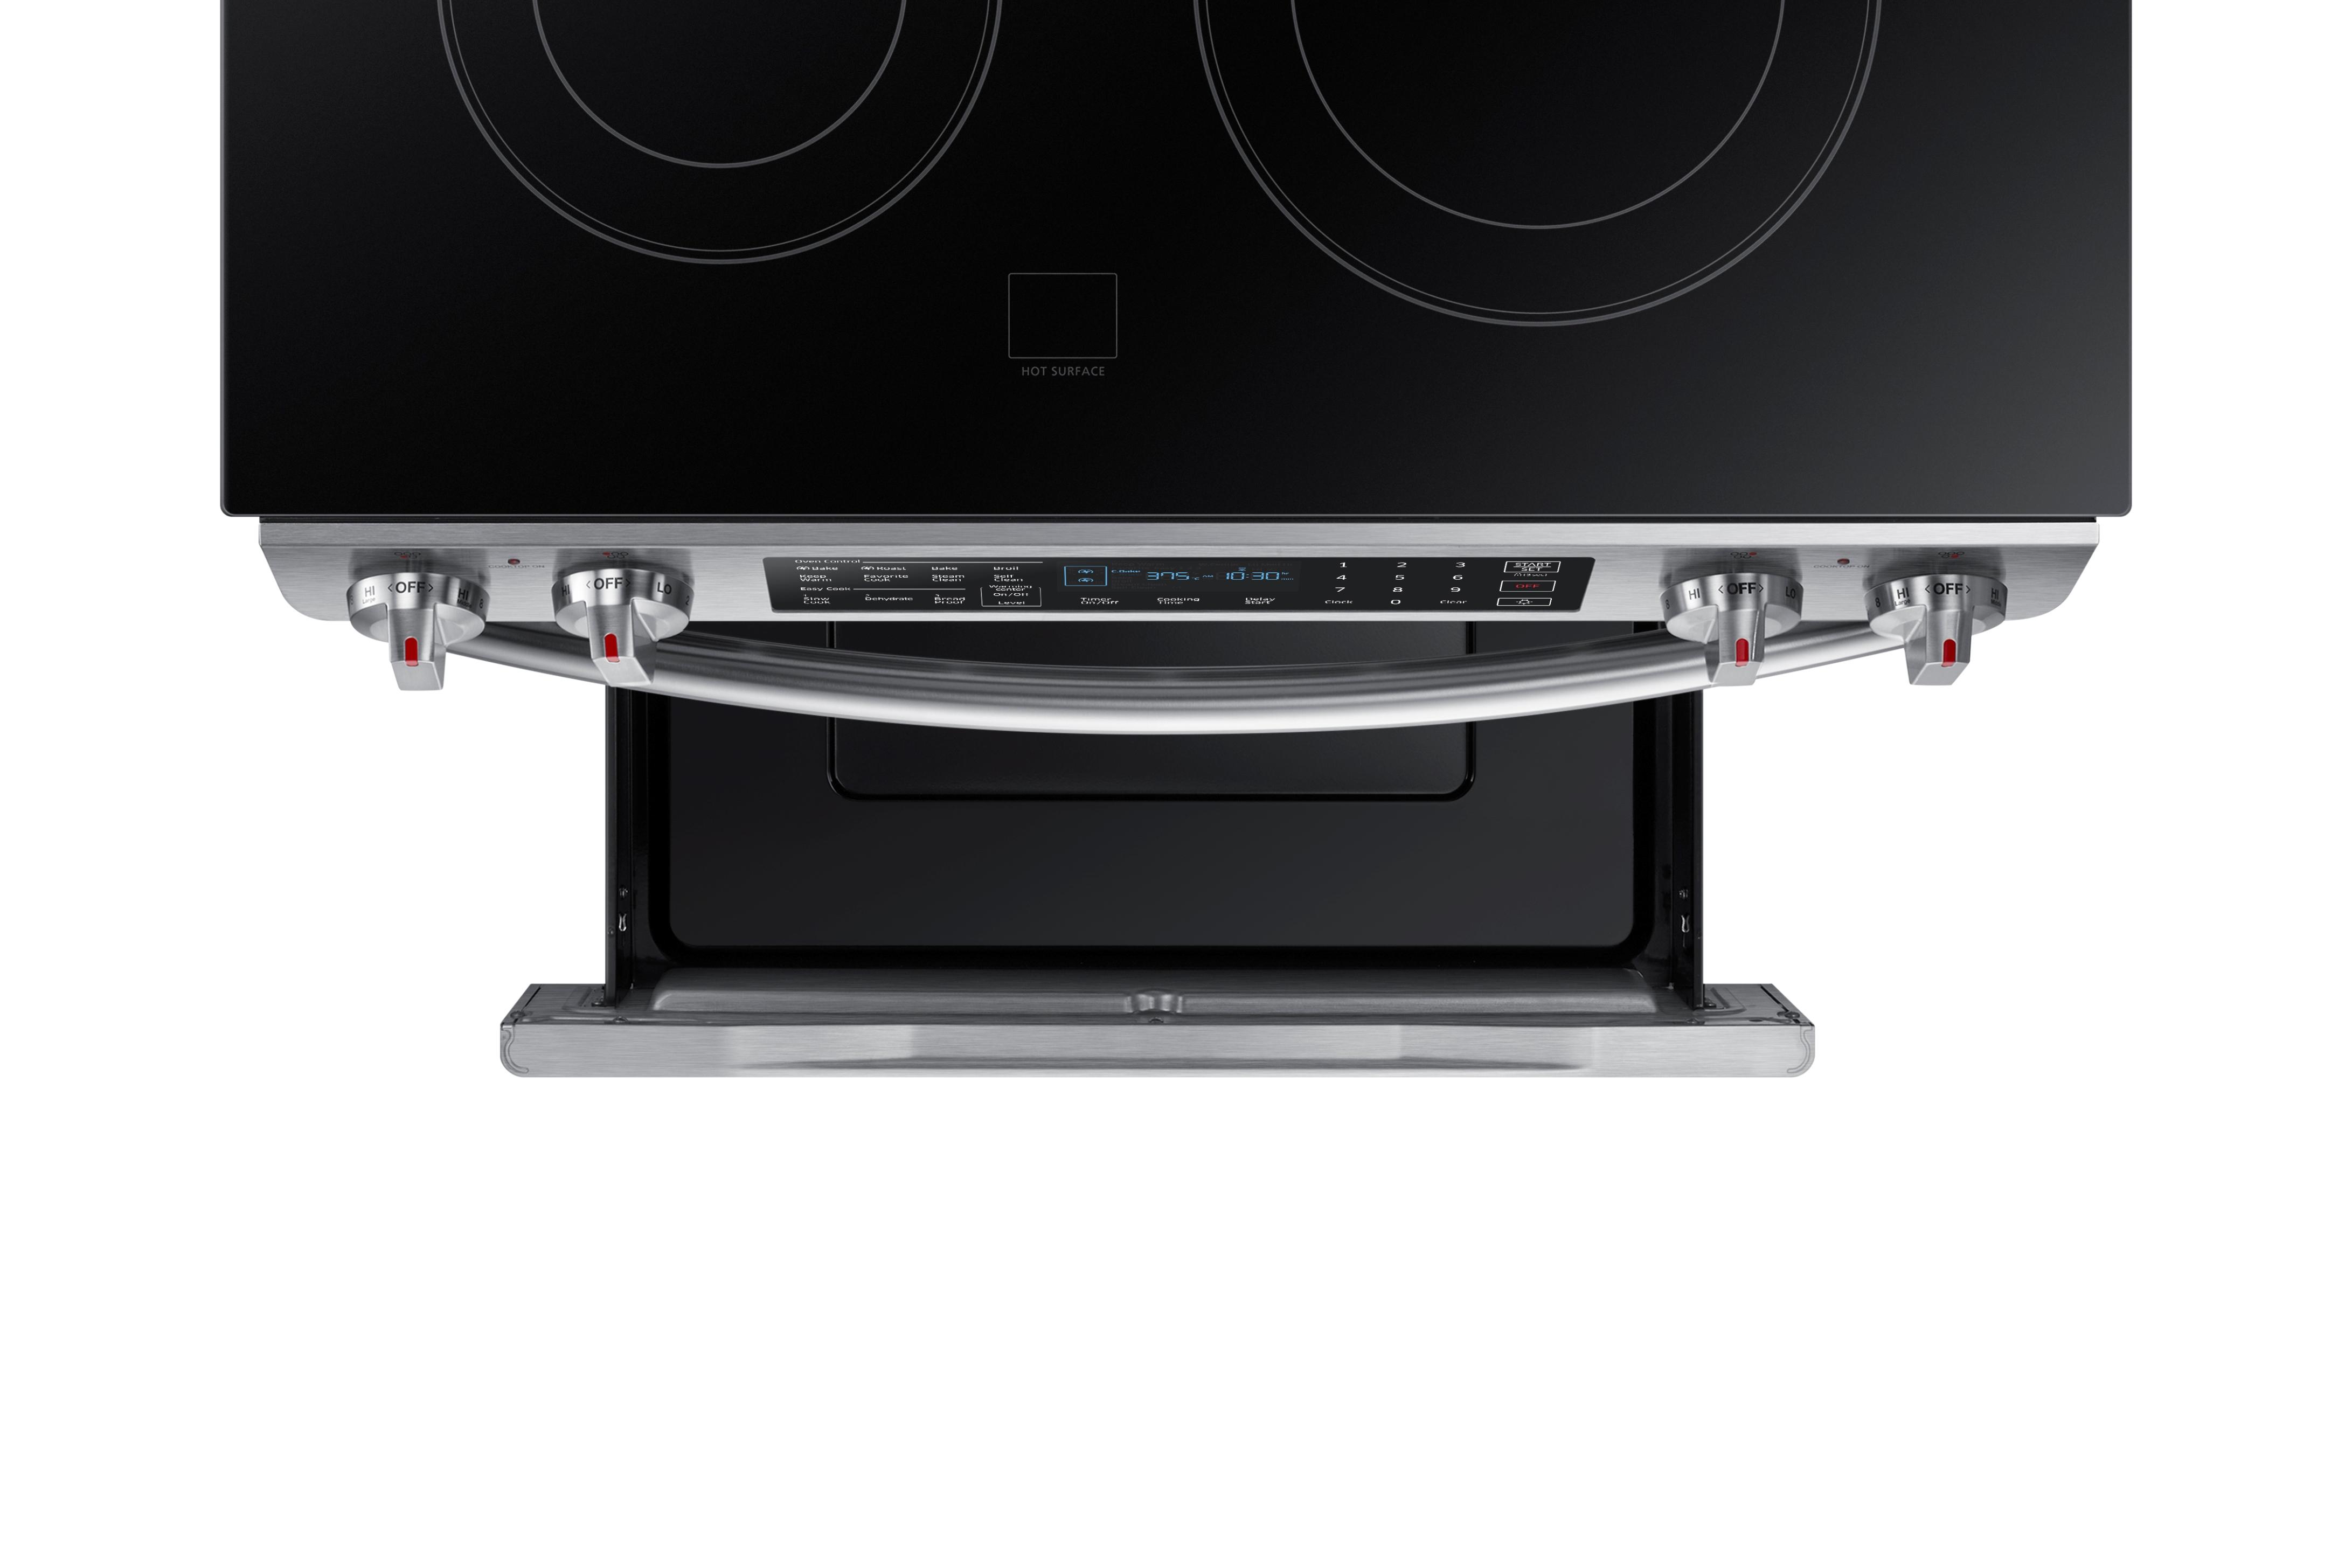 Samsung NE58K9430SS 5.8 cu. ft. Slide-In Electric Range